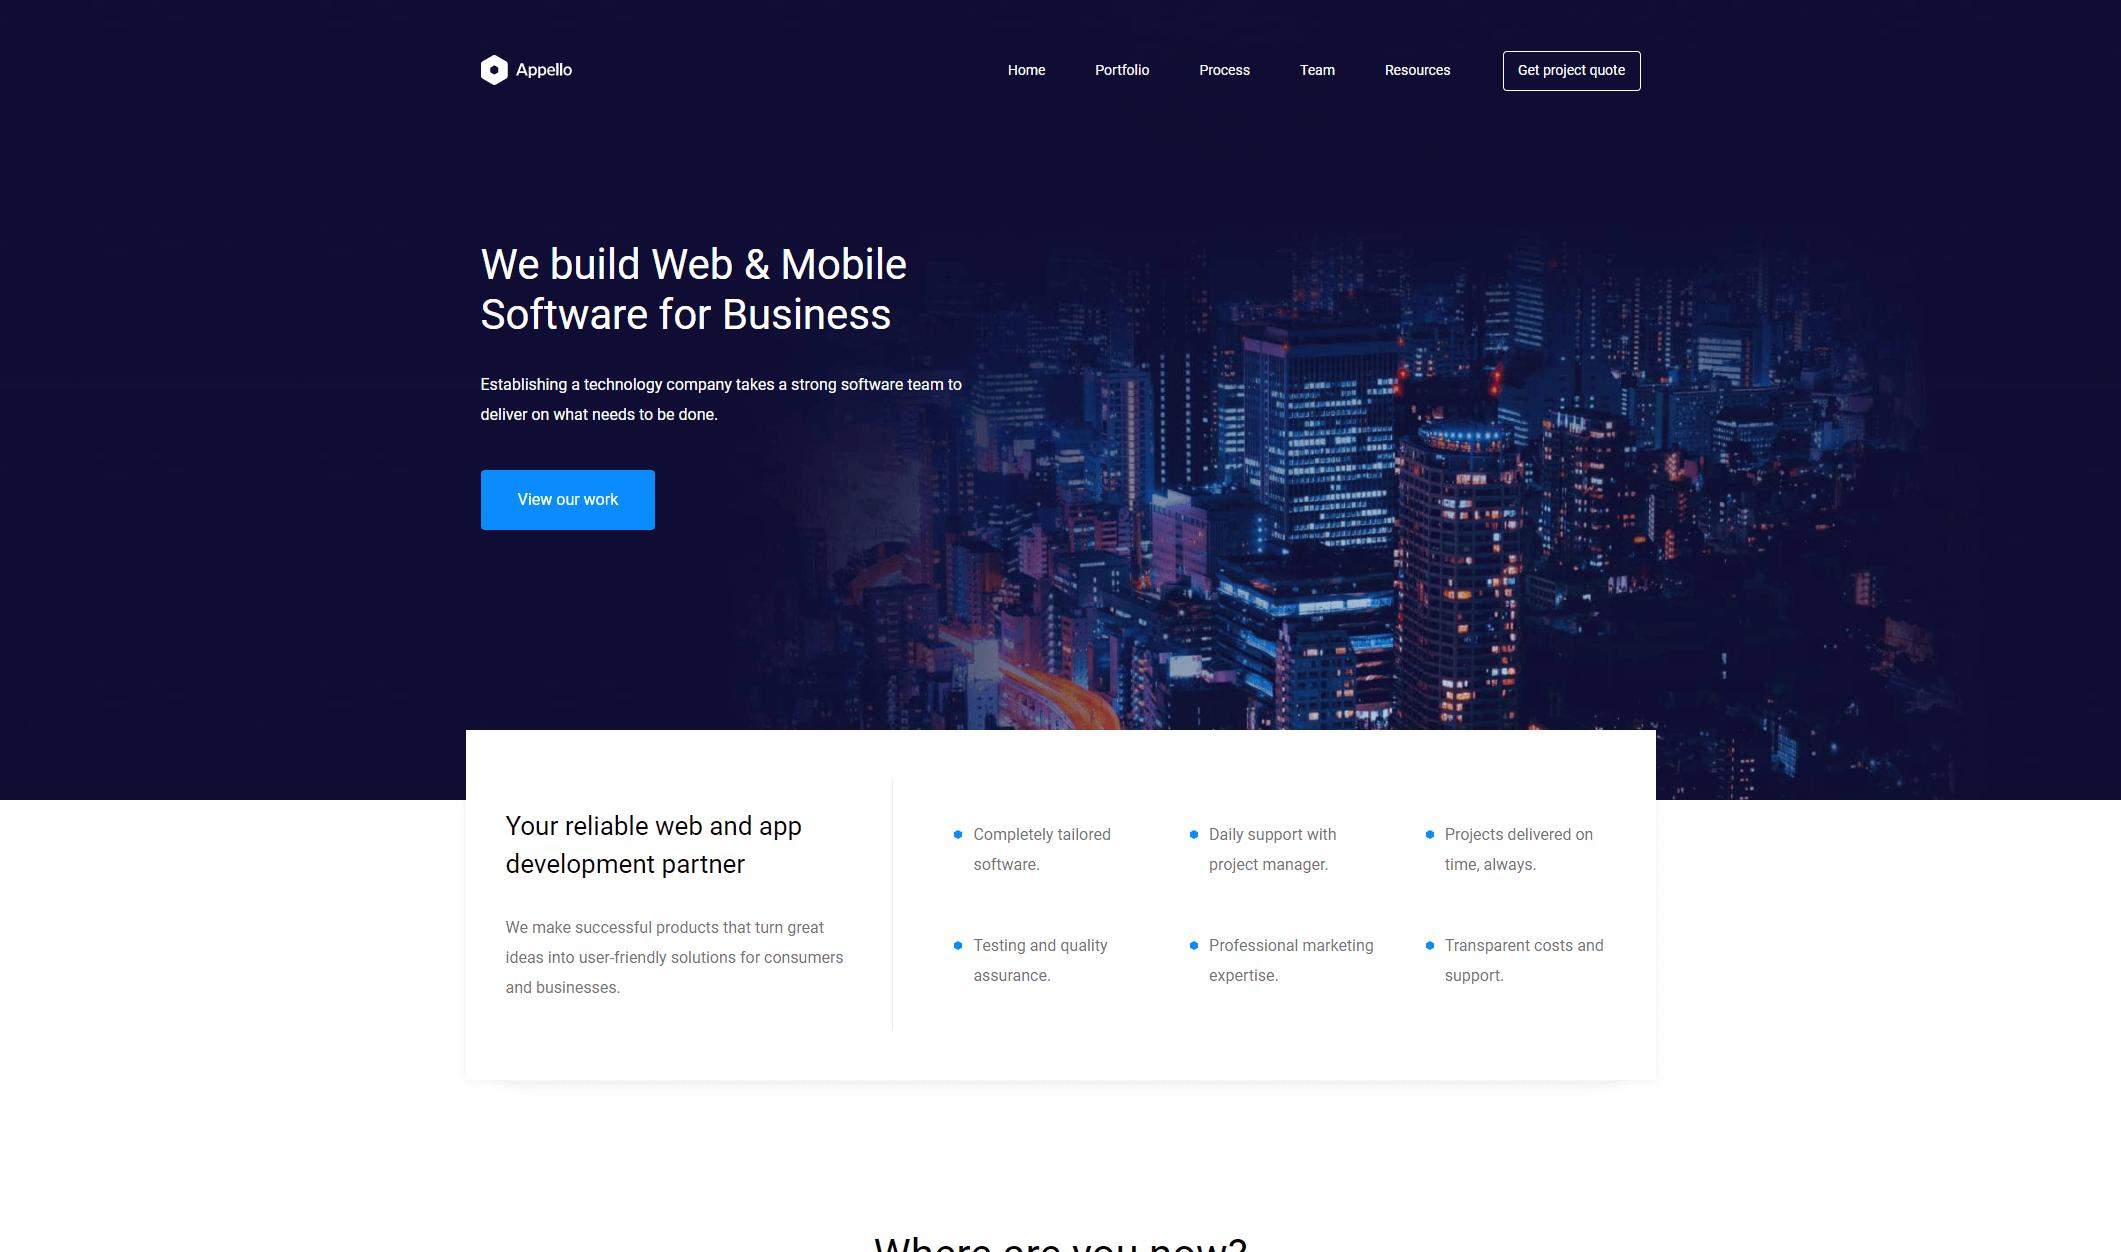 appello.com.au